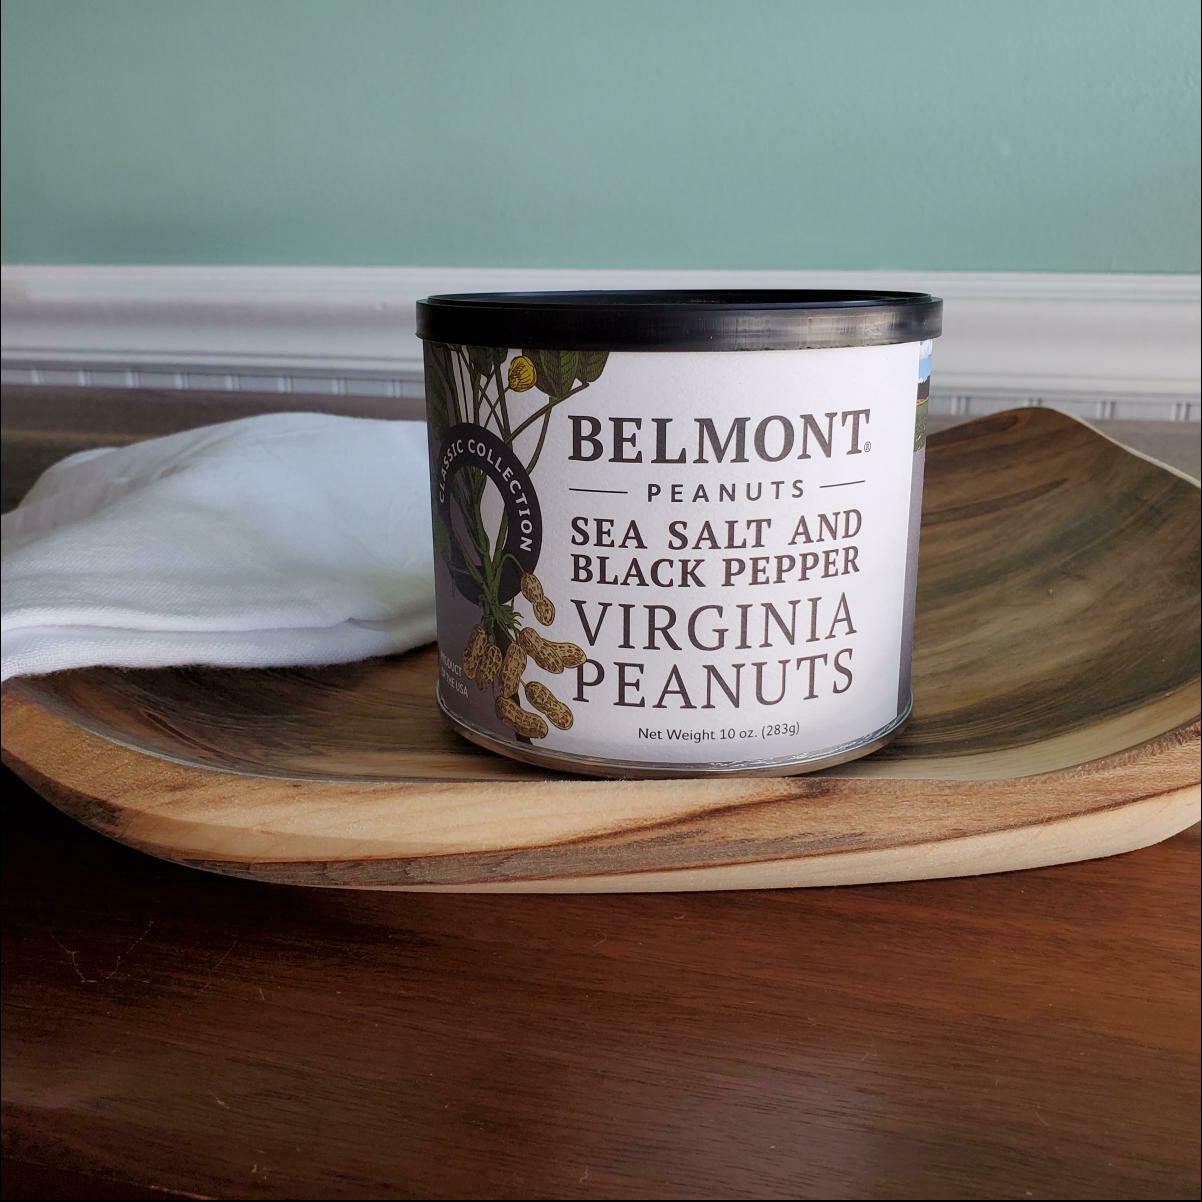 Belmont Peanuts Sea Salt and Black Pepper